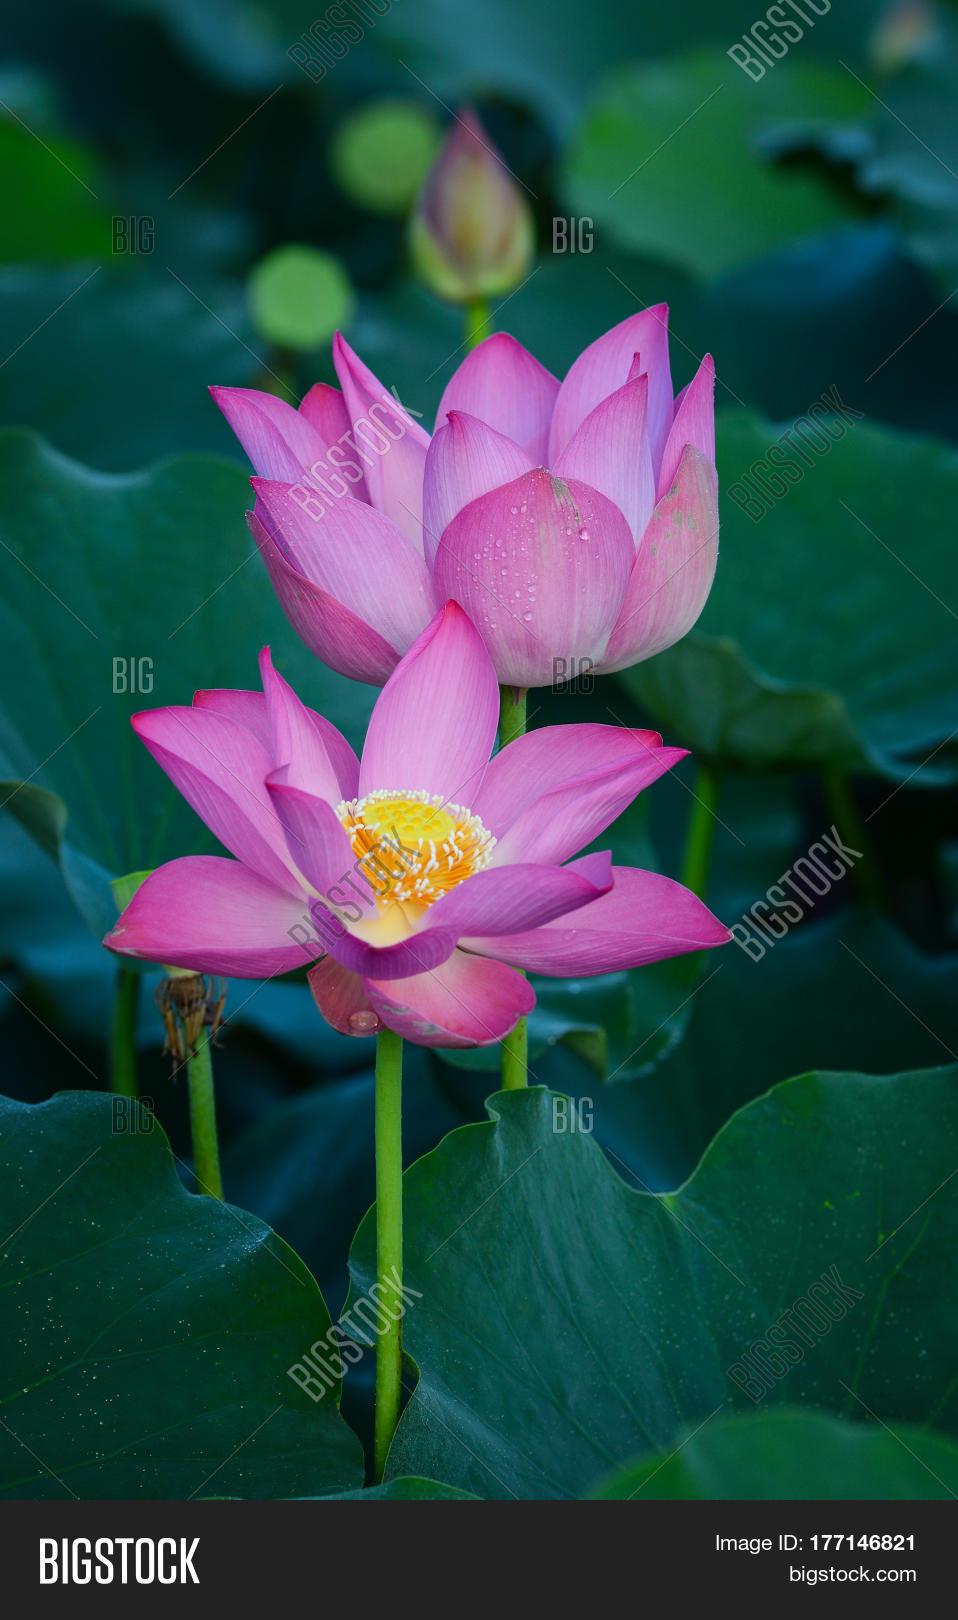 Lotus flower blooming image photo free trial bigstock lotus flower blooming at summer time izmirmasajfo